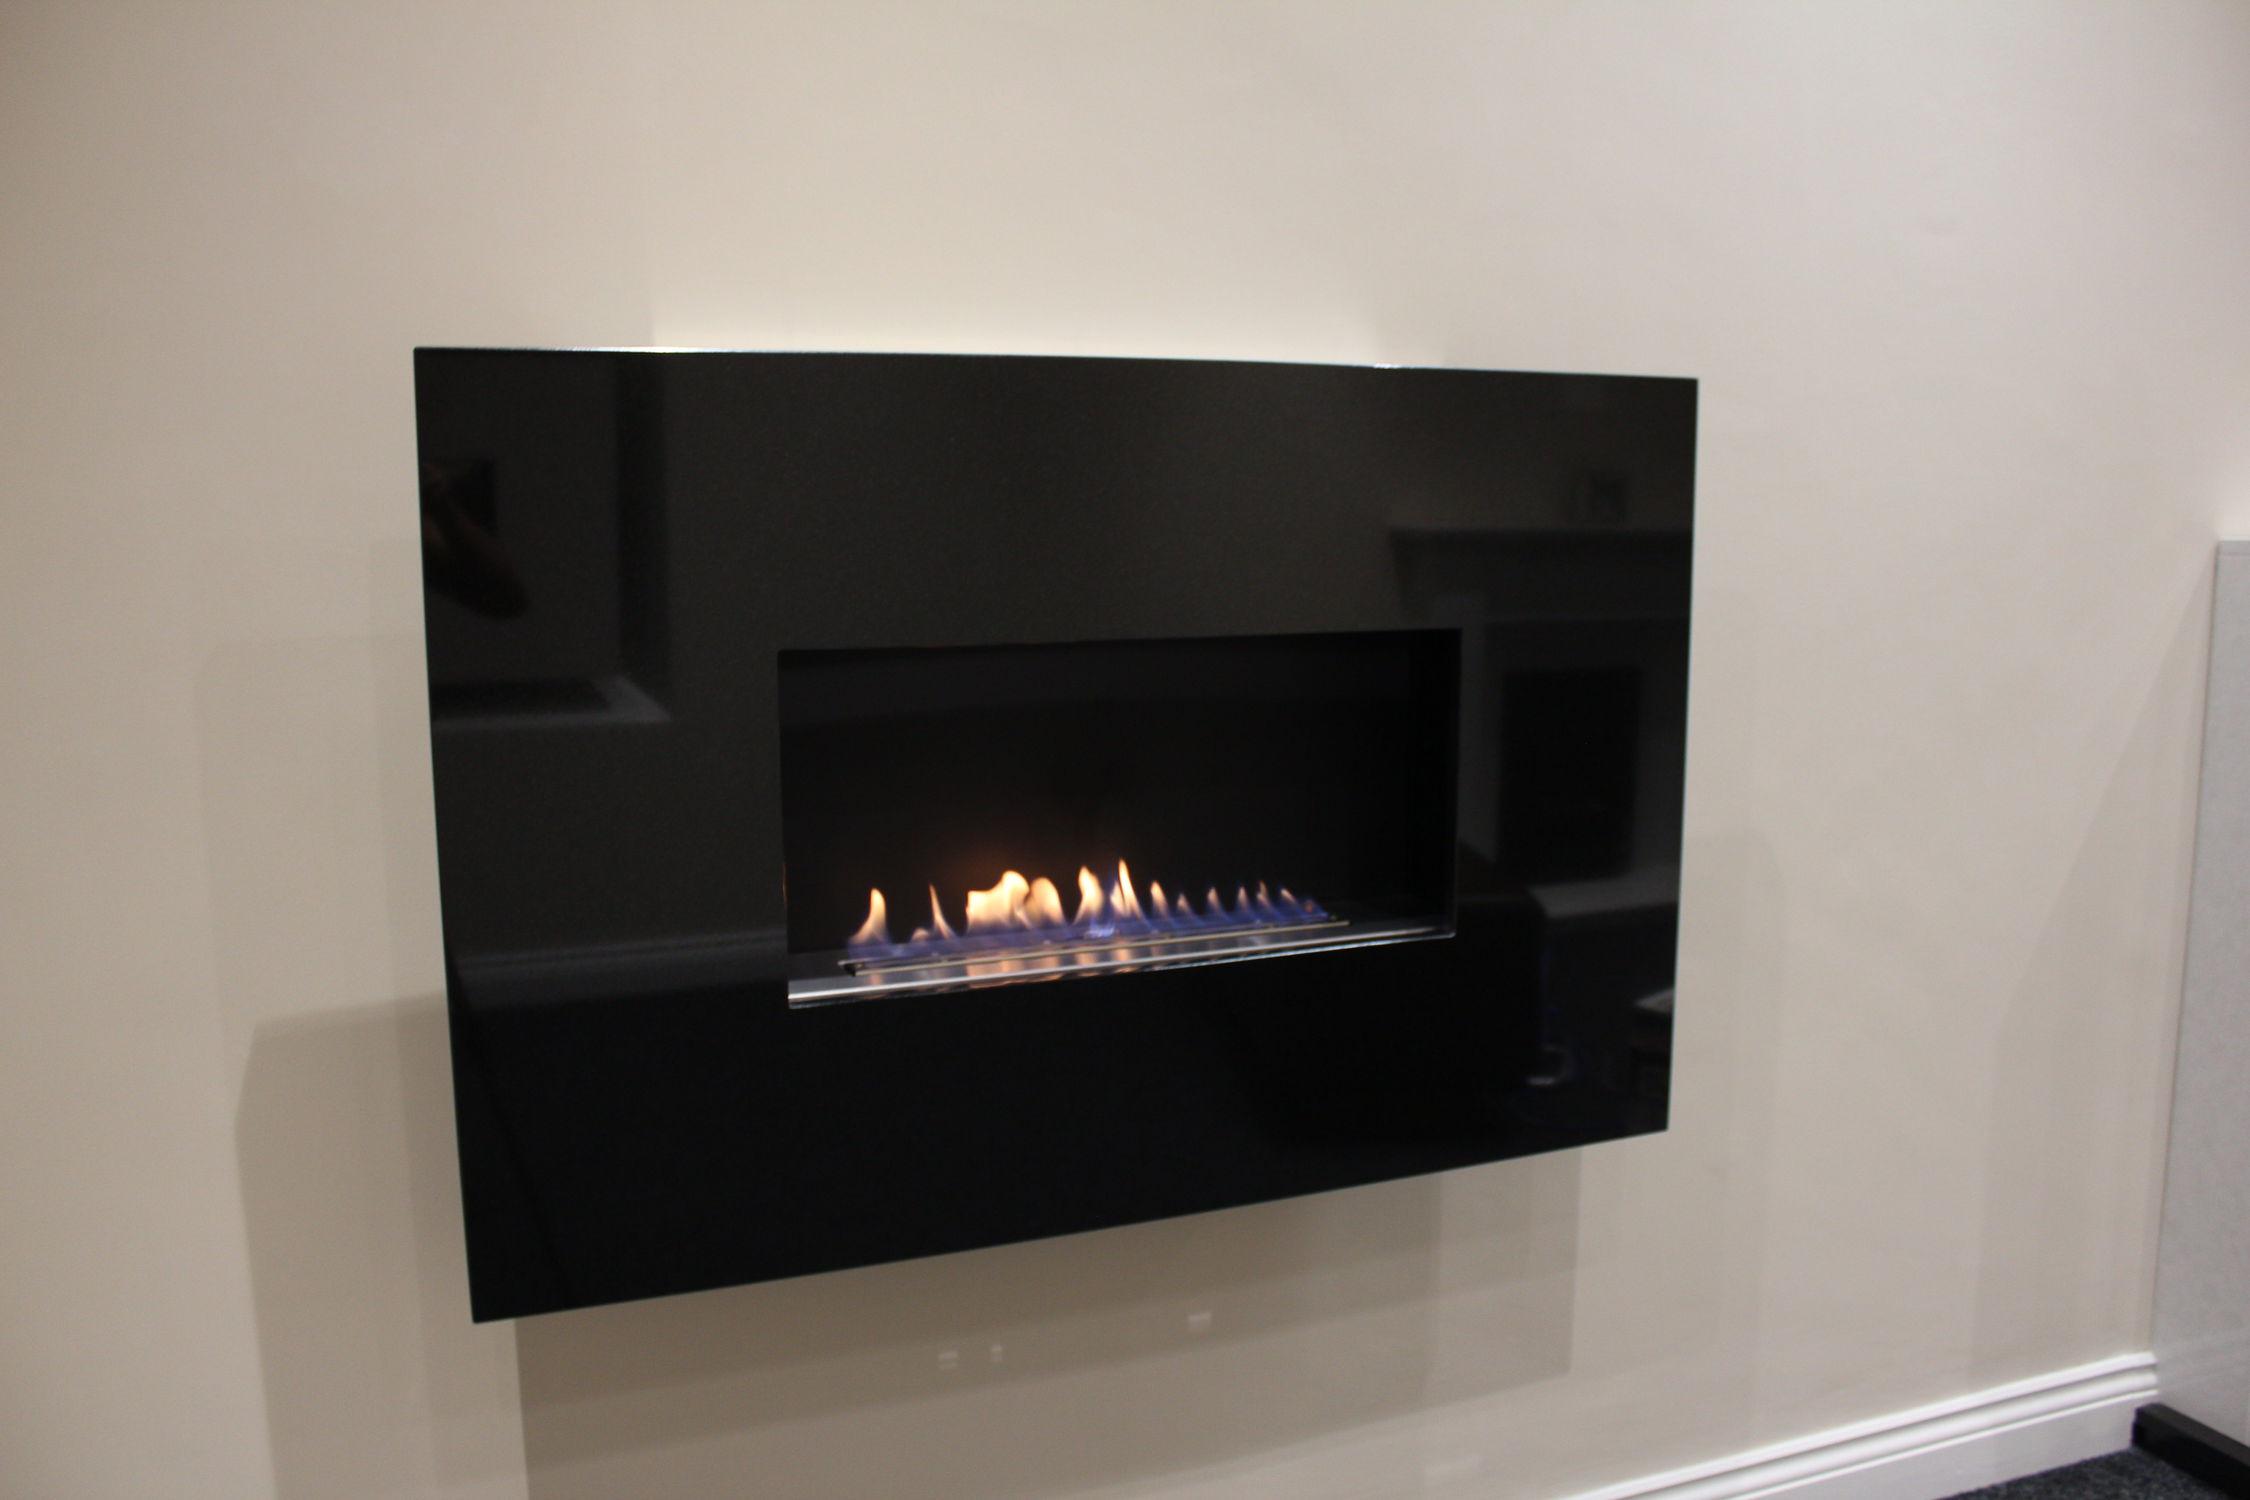 chimenea de gas moderna de diseño original hogar abierto